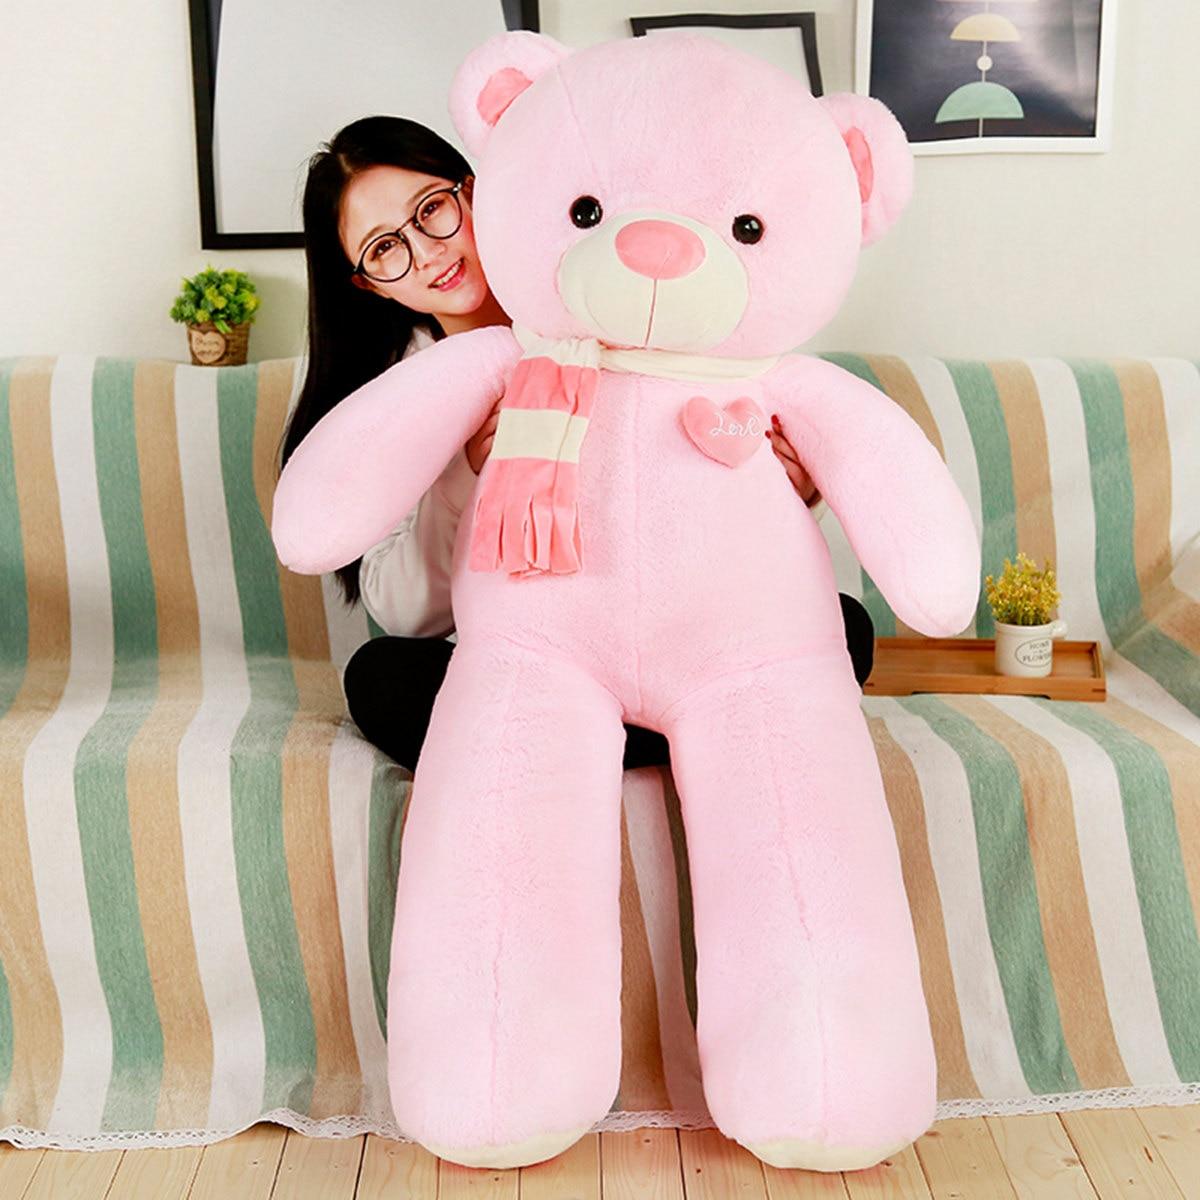 Teddy Bear Plush Toys Stuffed Animals Soft Big Heart Bear Yesbear Pillow Birhday Valentines Day Gifts For Girls Kid Just6F